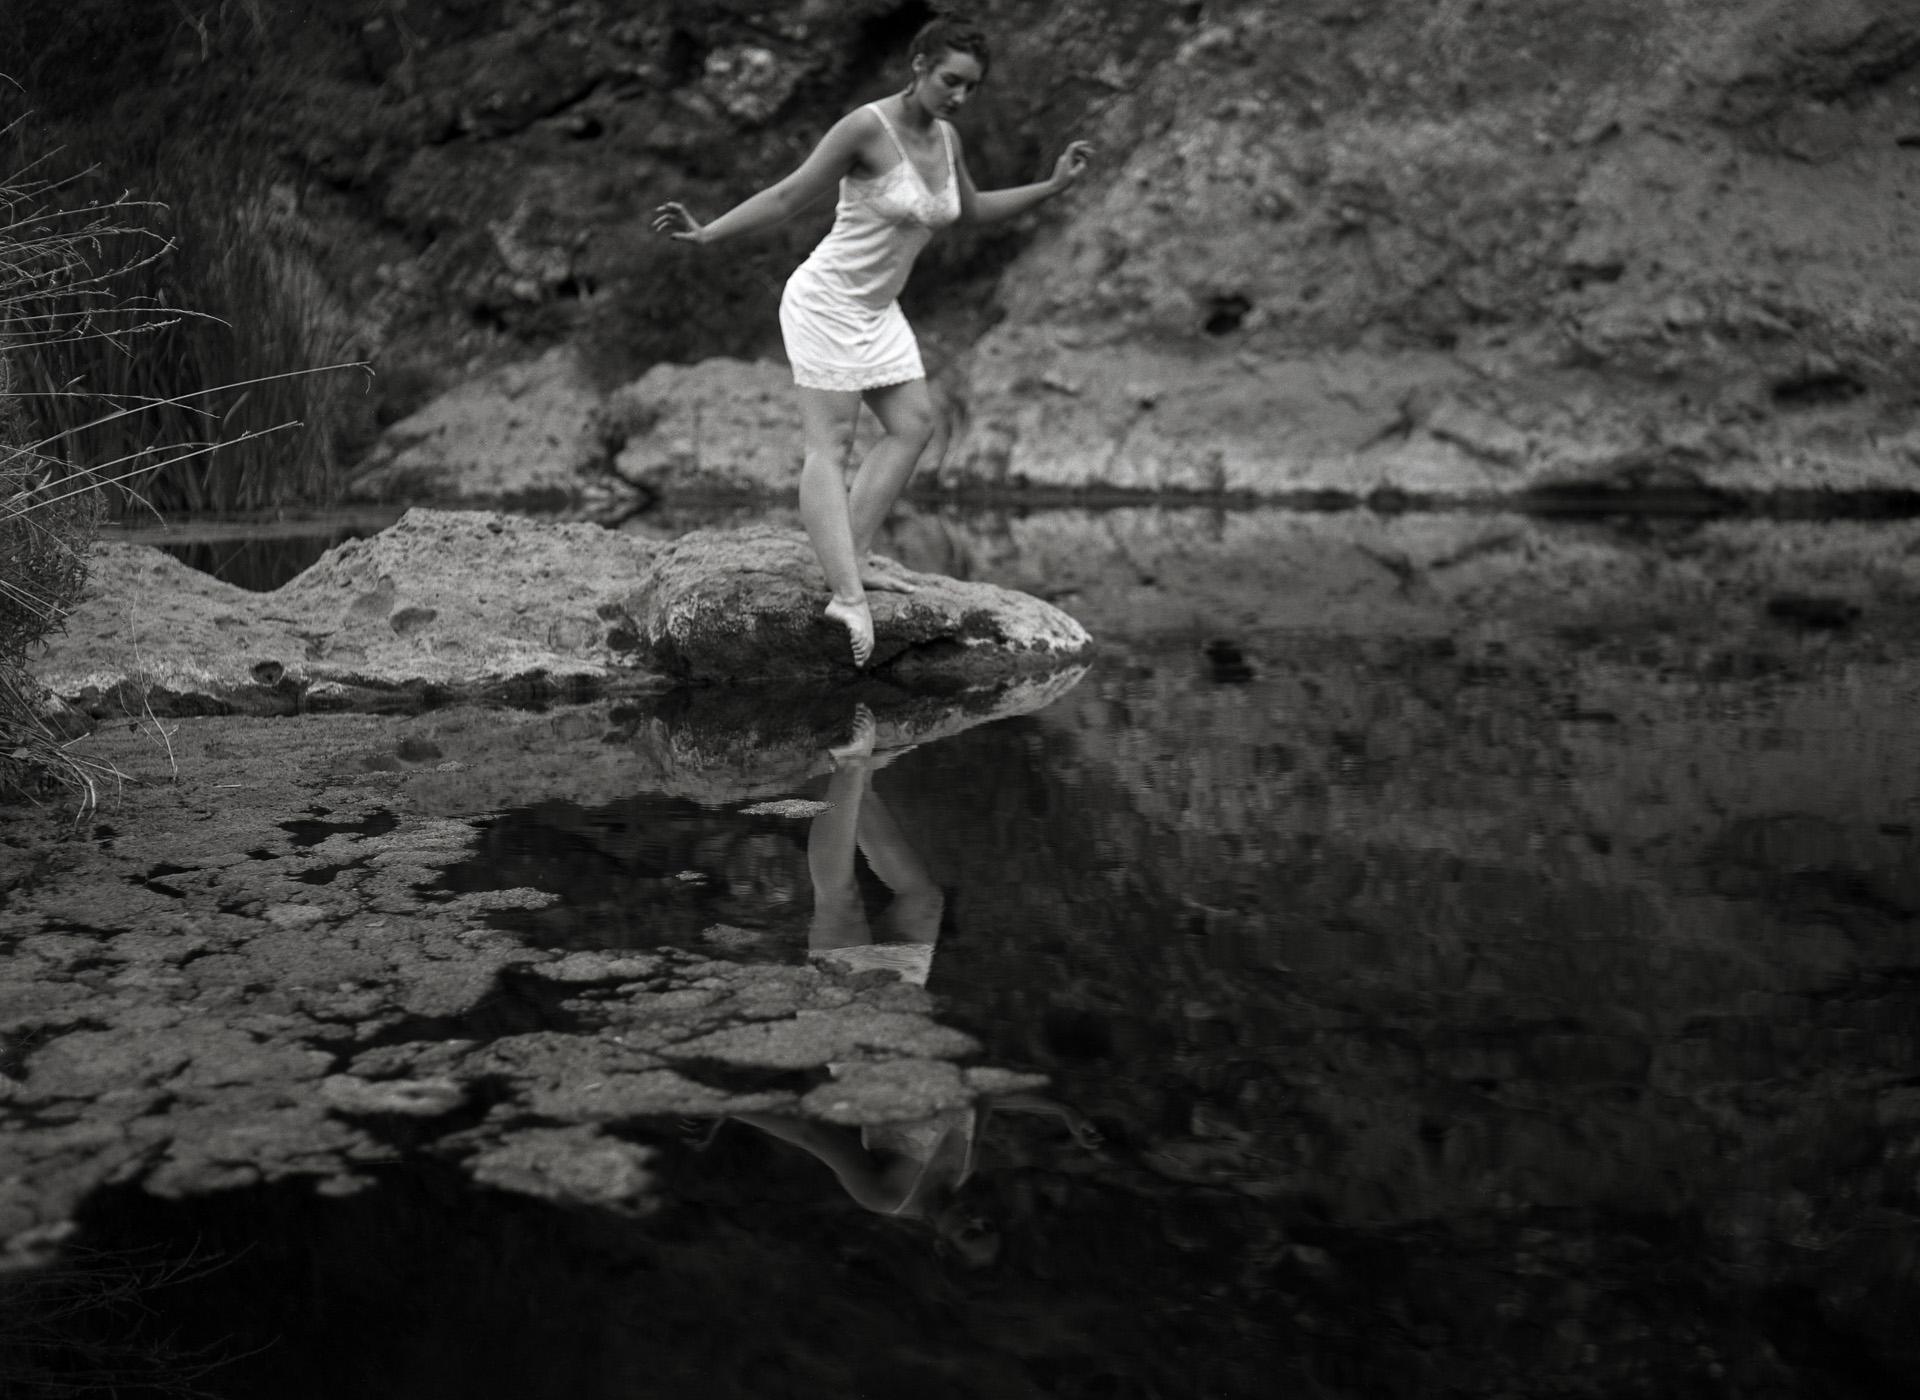 Ilford Delta 100 film, Graphlex Century Graphic,Kodak Ektar 101mm f4.5